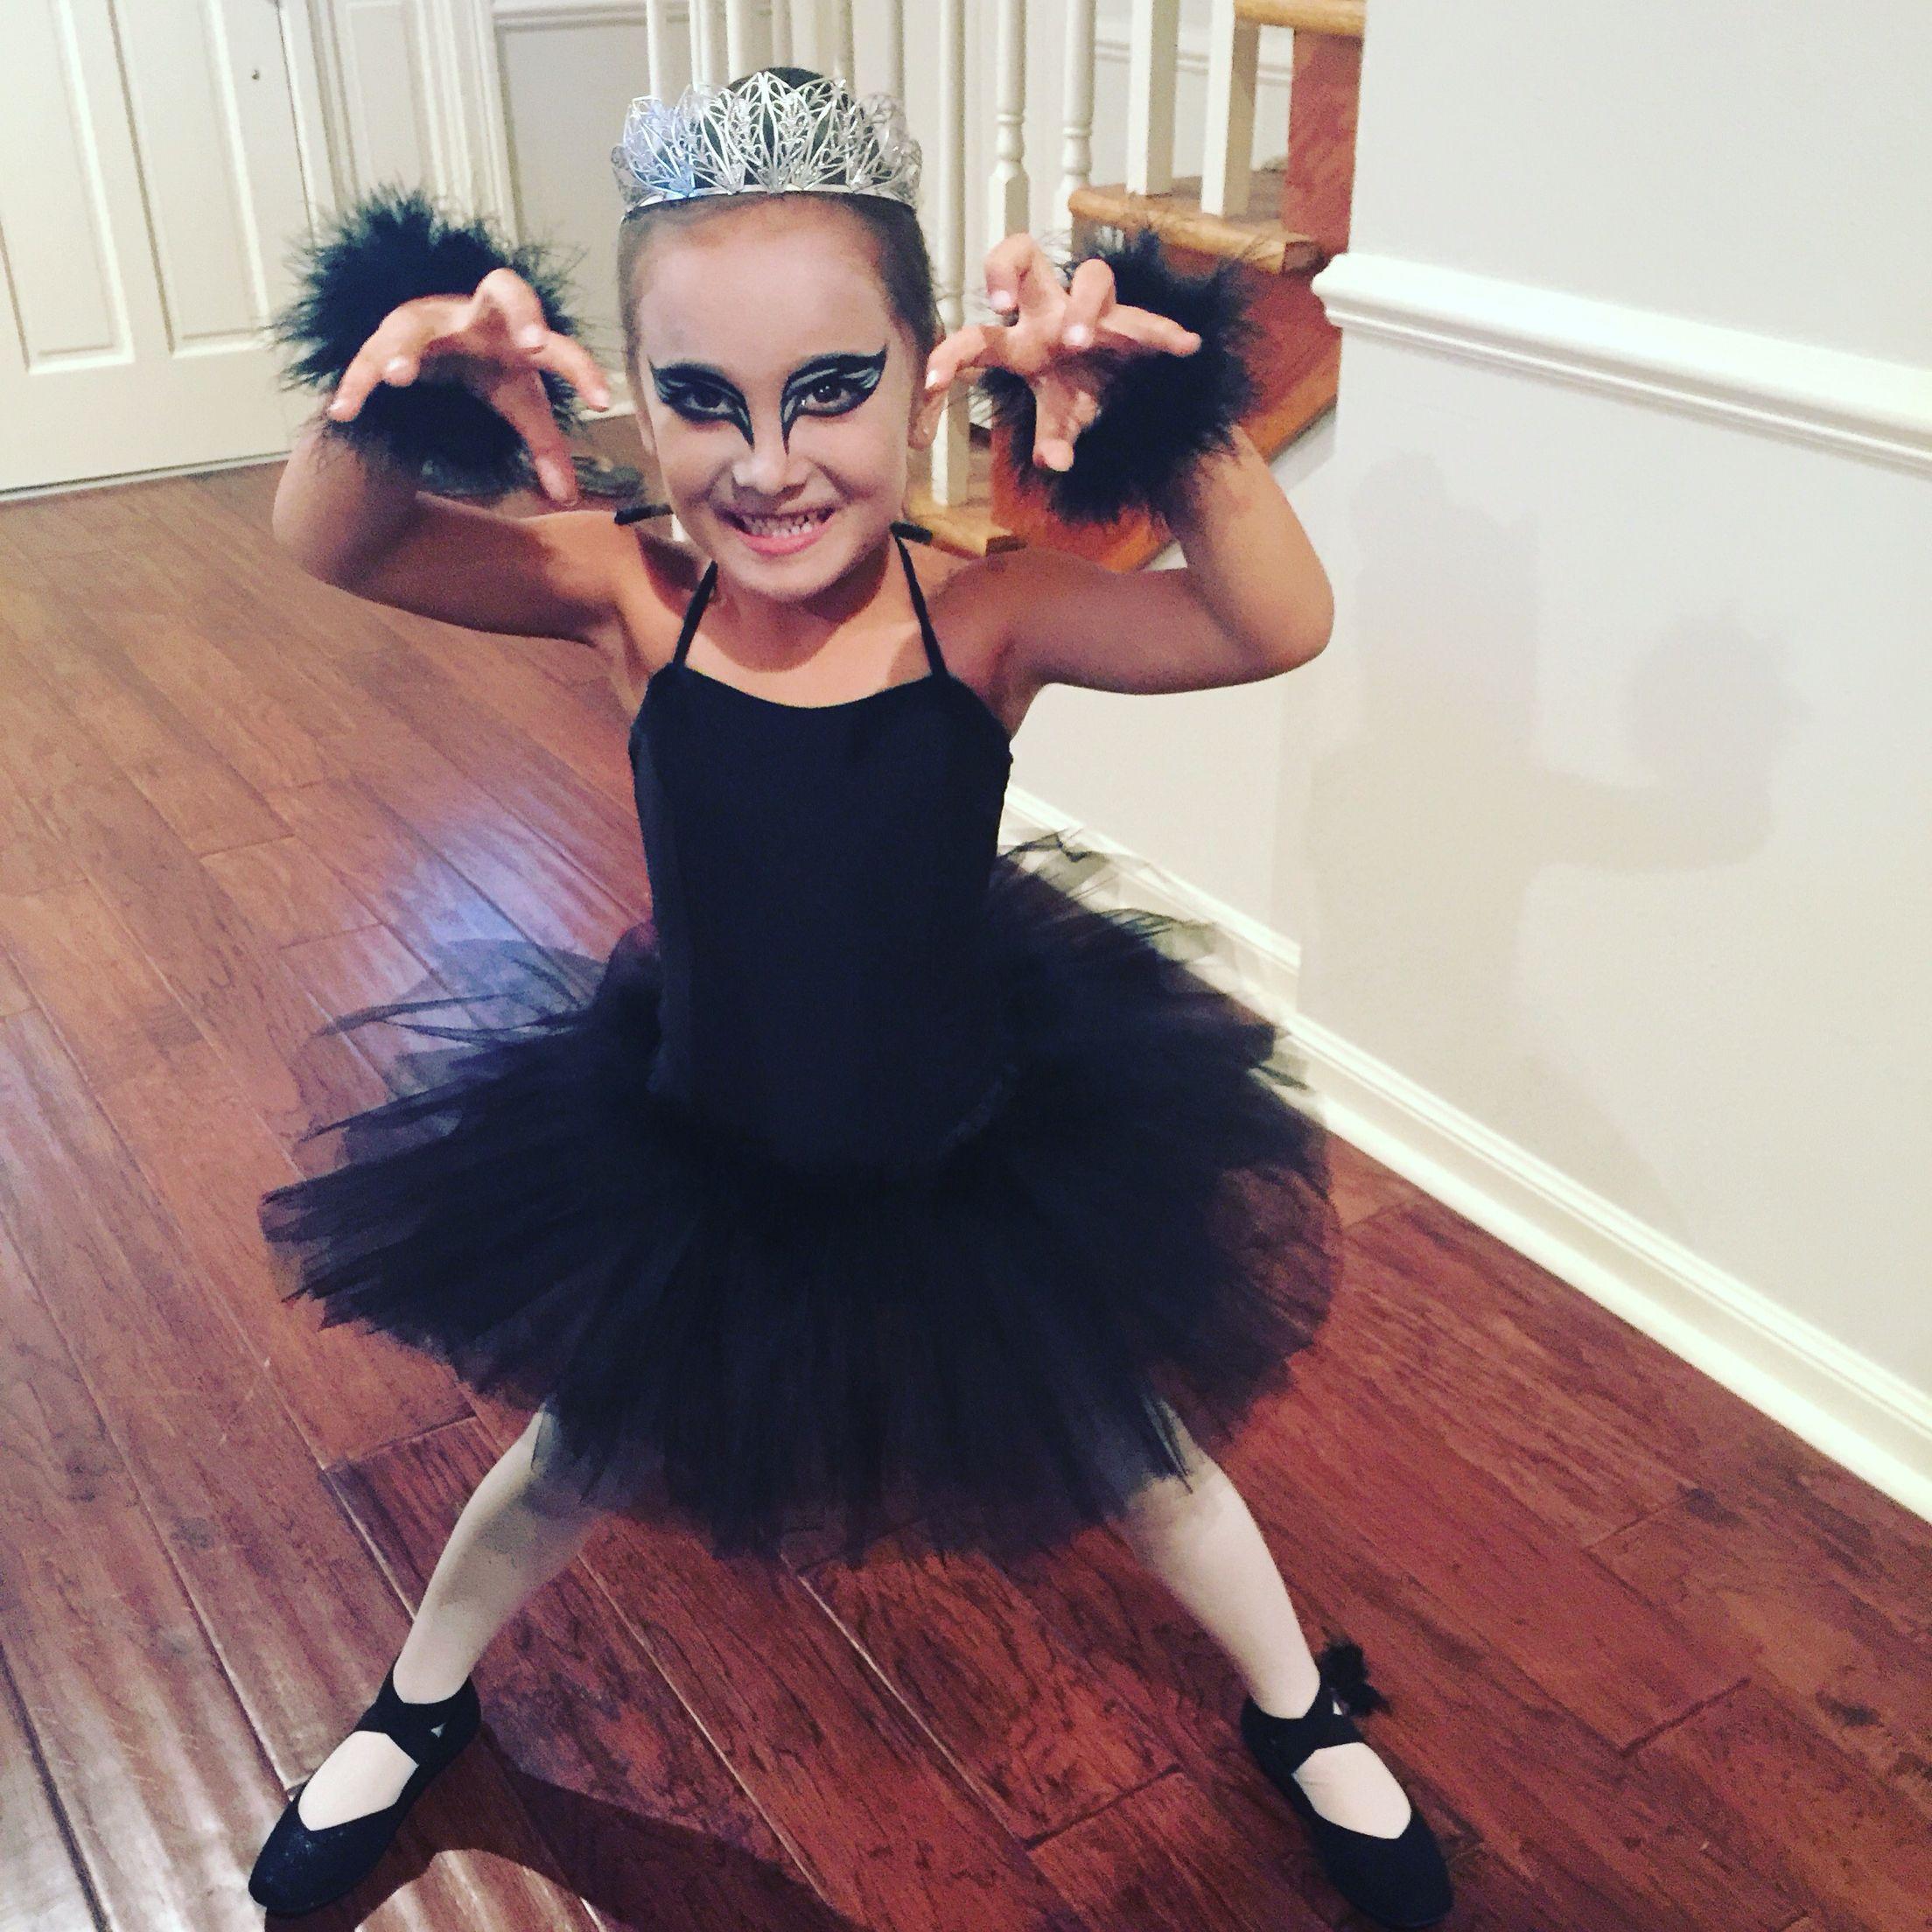 b1ea568a2 Black swan kids Halloween costume and makeup.